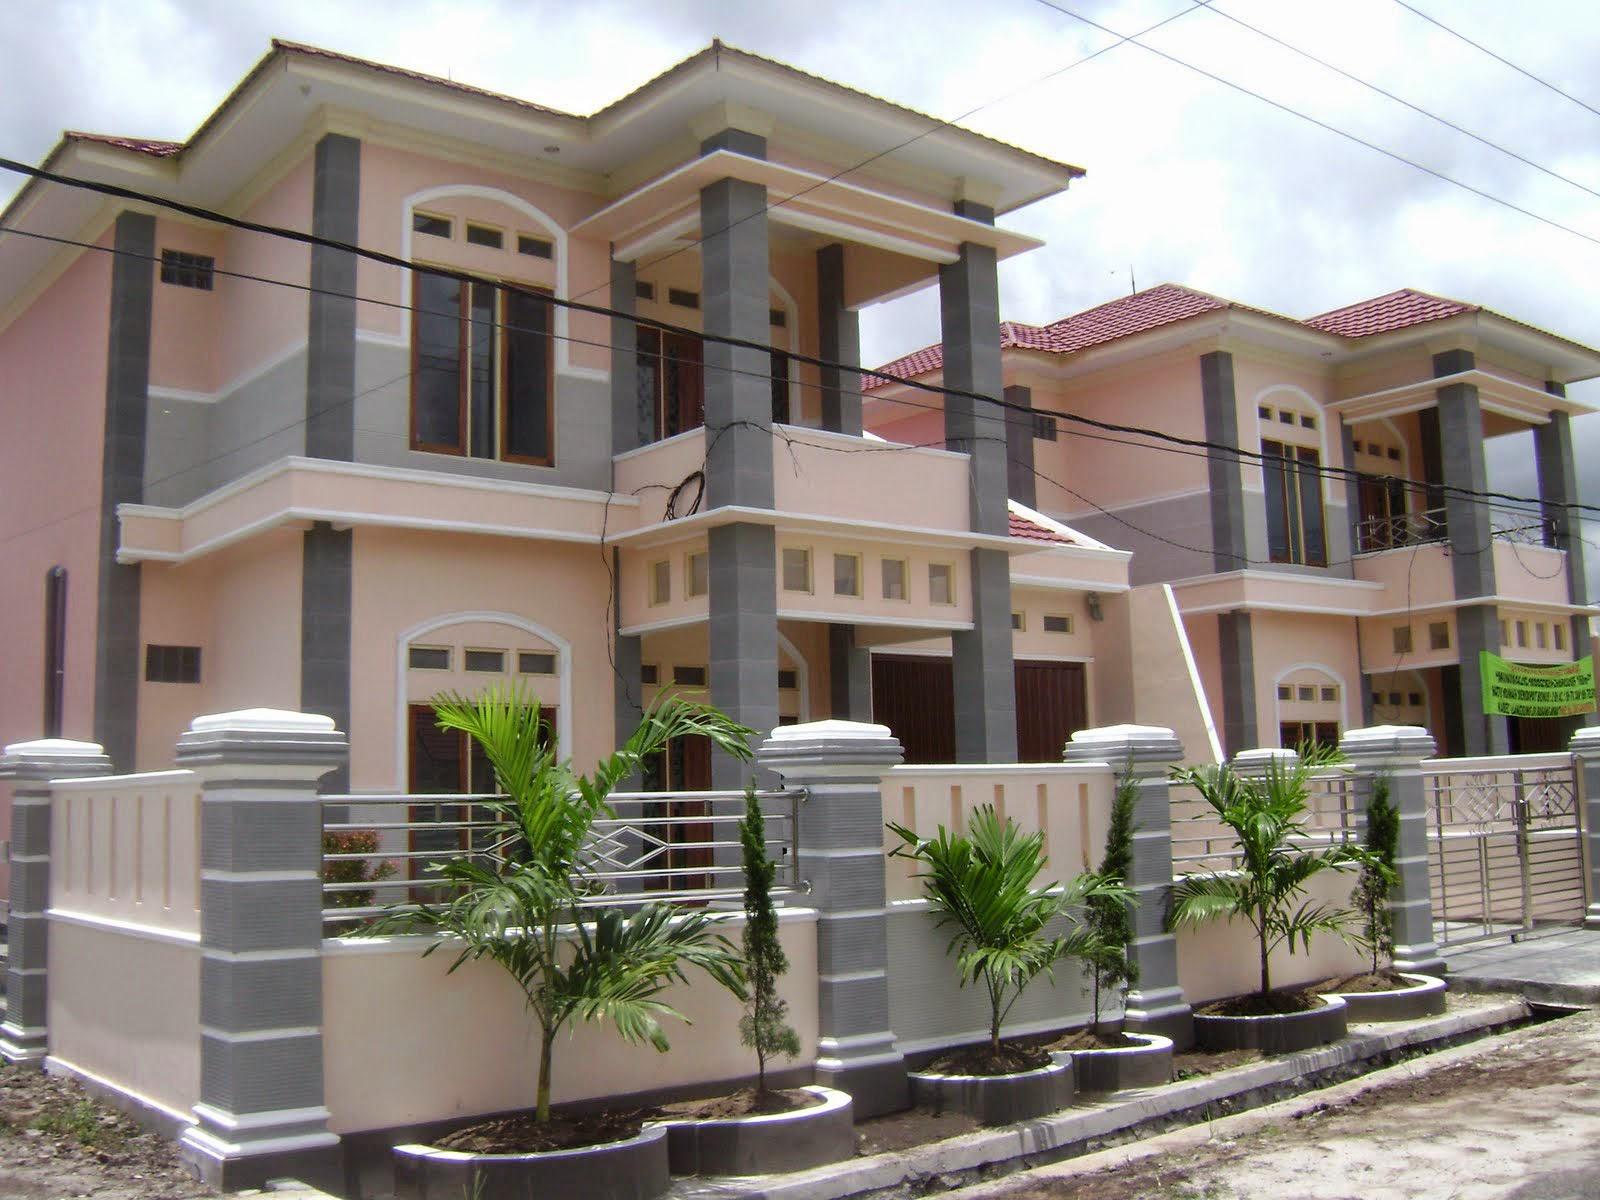 Home-to-Home-Minimalist-Fence